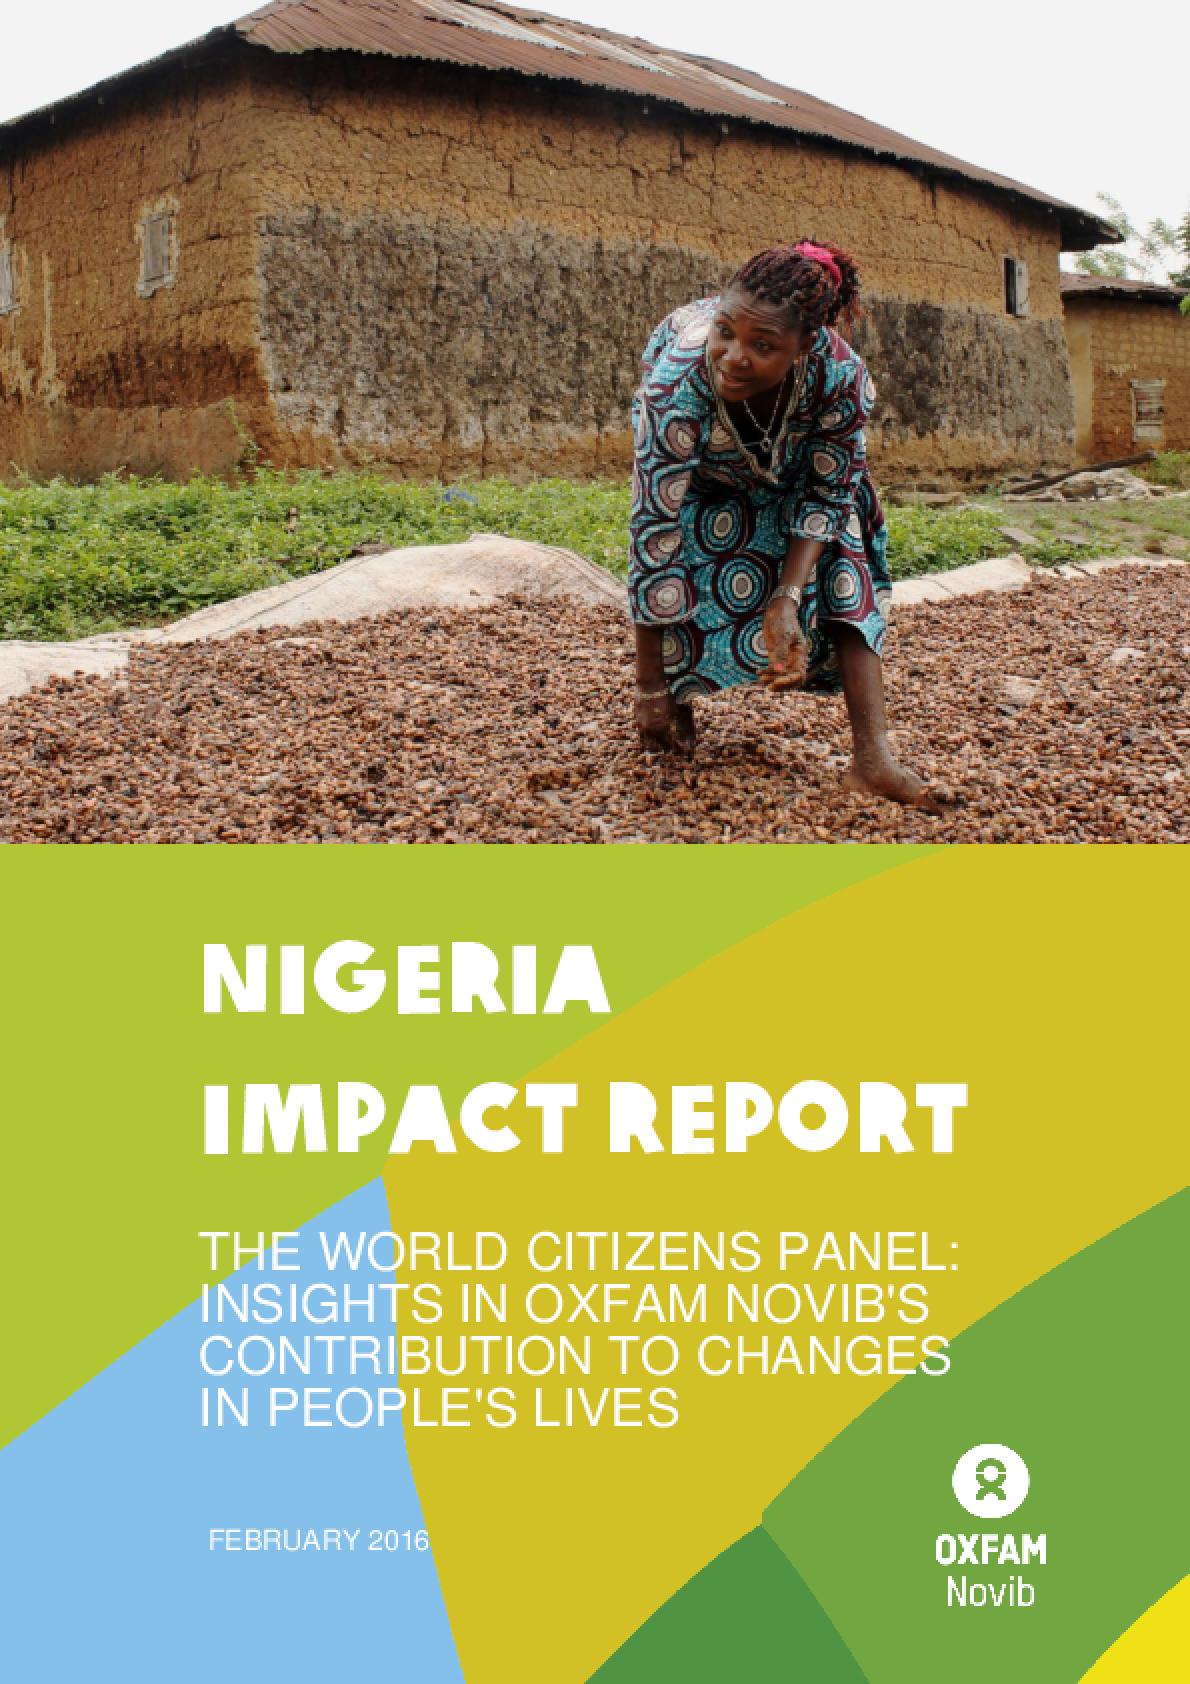 Nigeria Impact Report: The World Citizens Panel